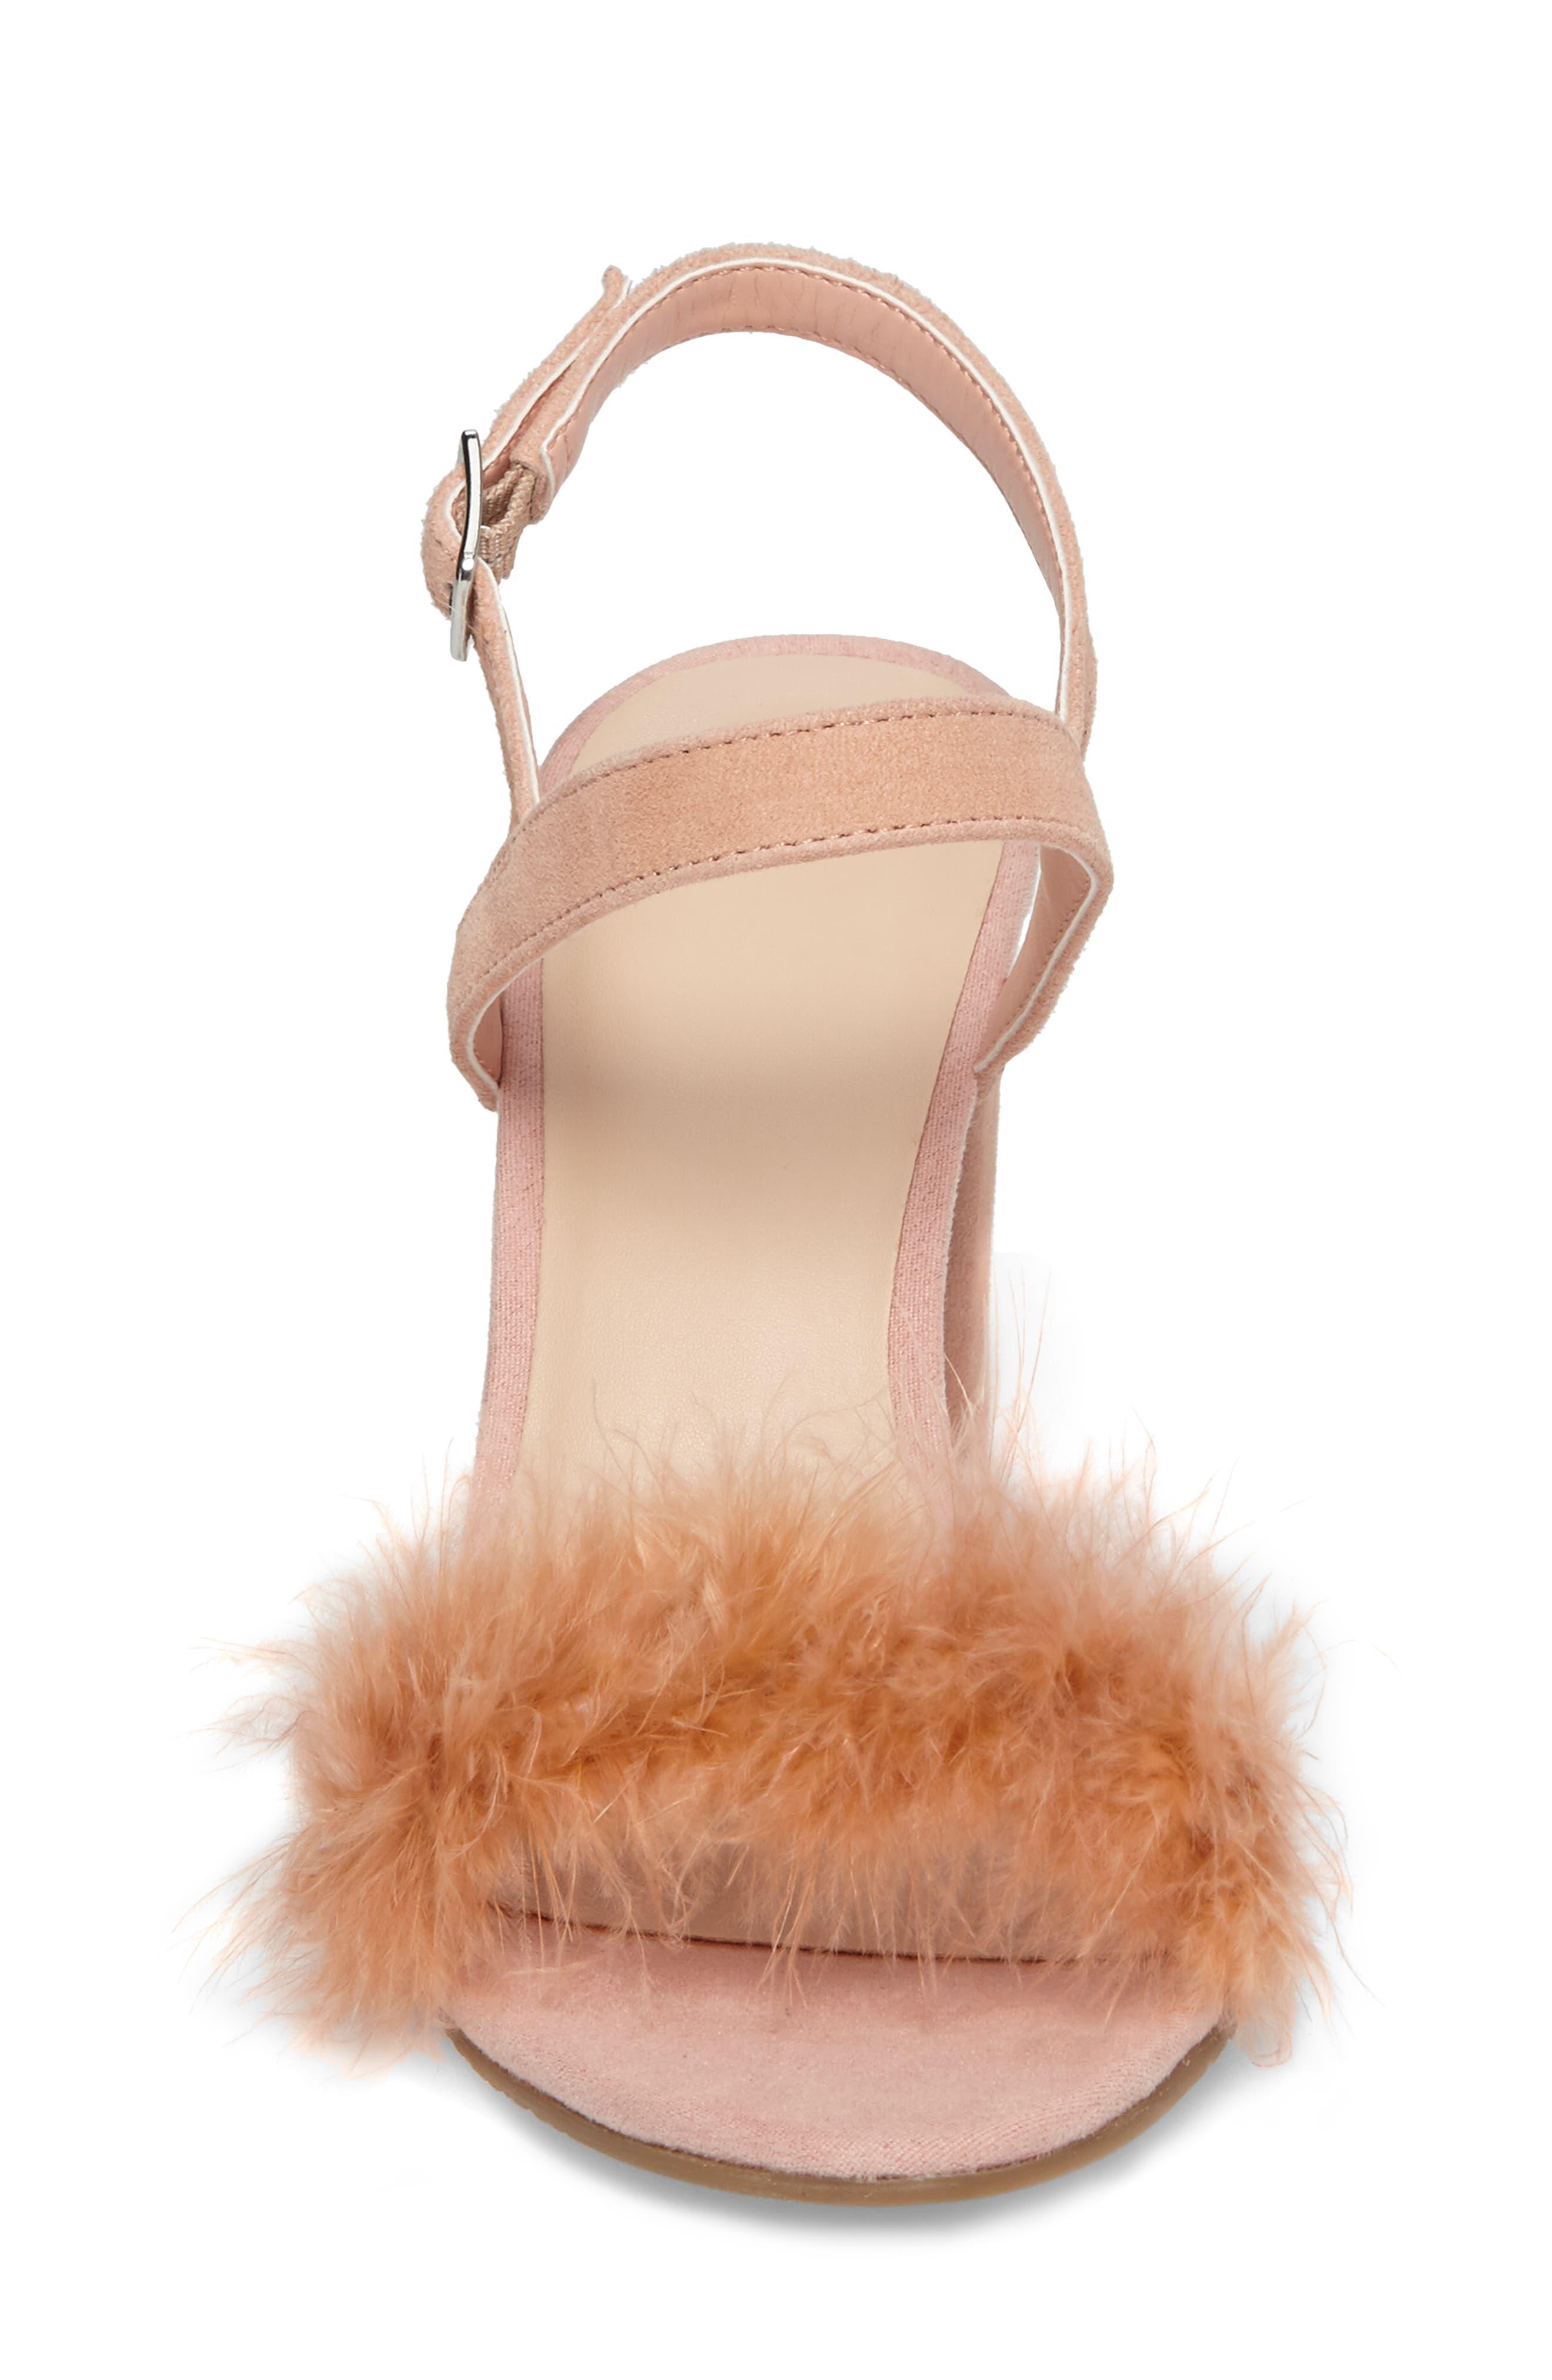 Lula Block Heel Slingback Sandal,                             Alternate thumbnail 4, color,                             Blush Feathers